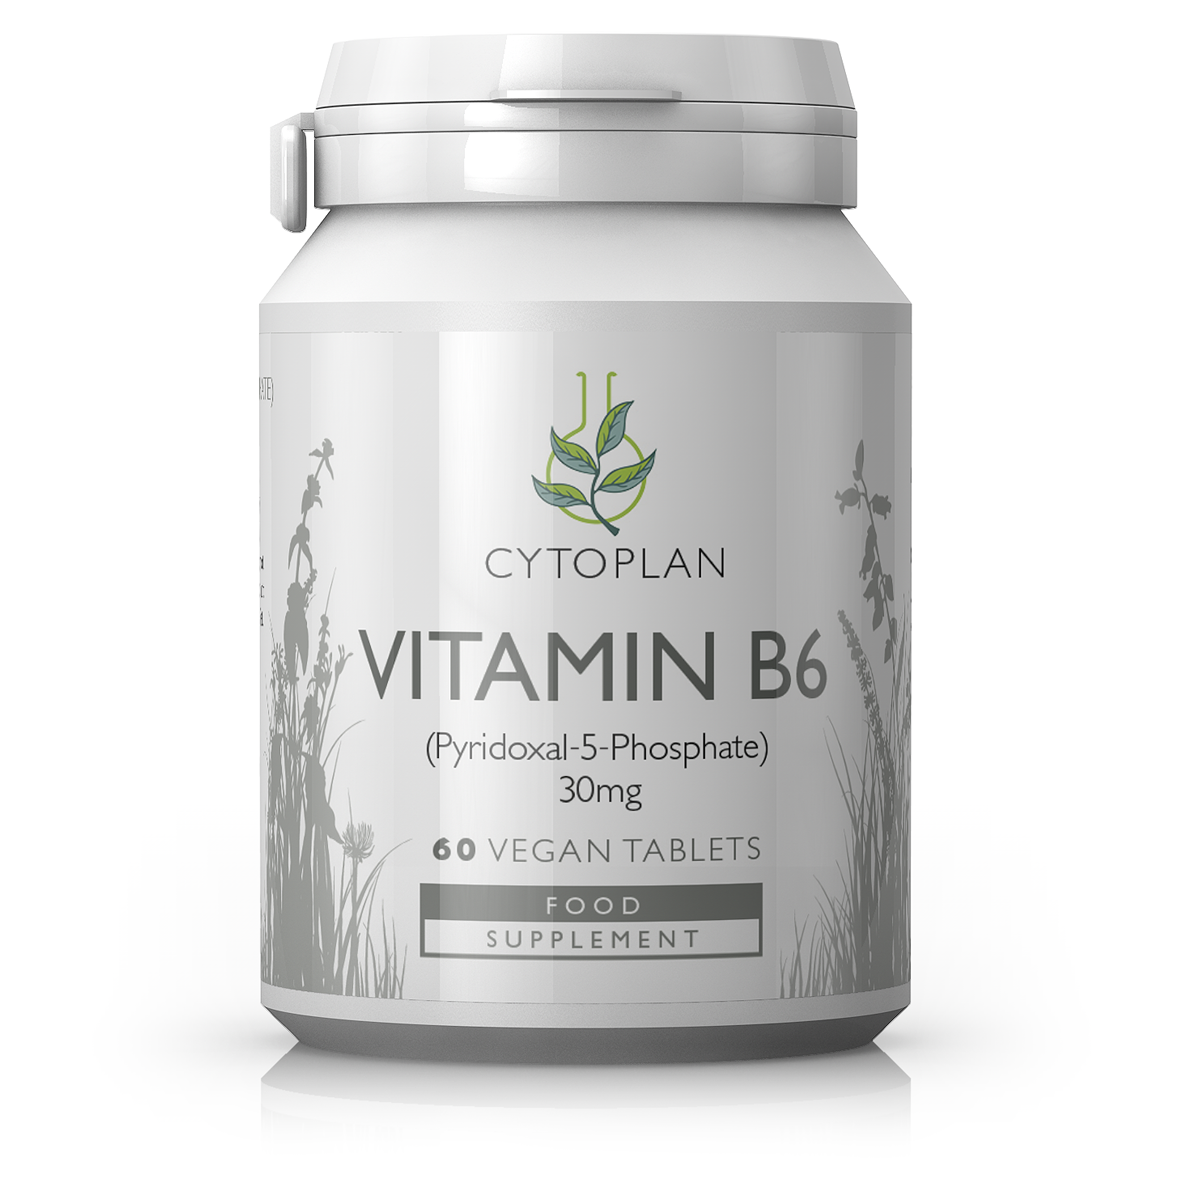 Vitamin B6 P5P 60's